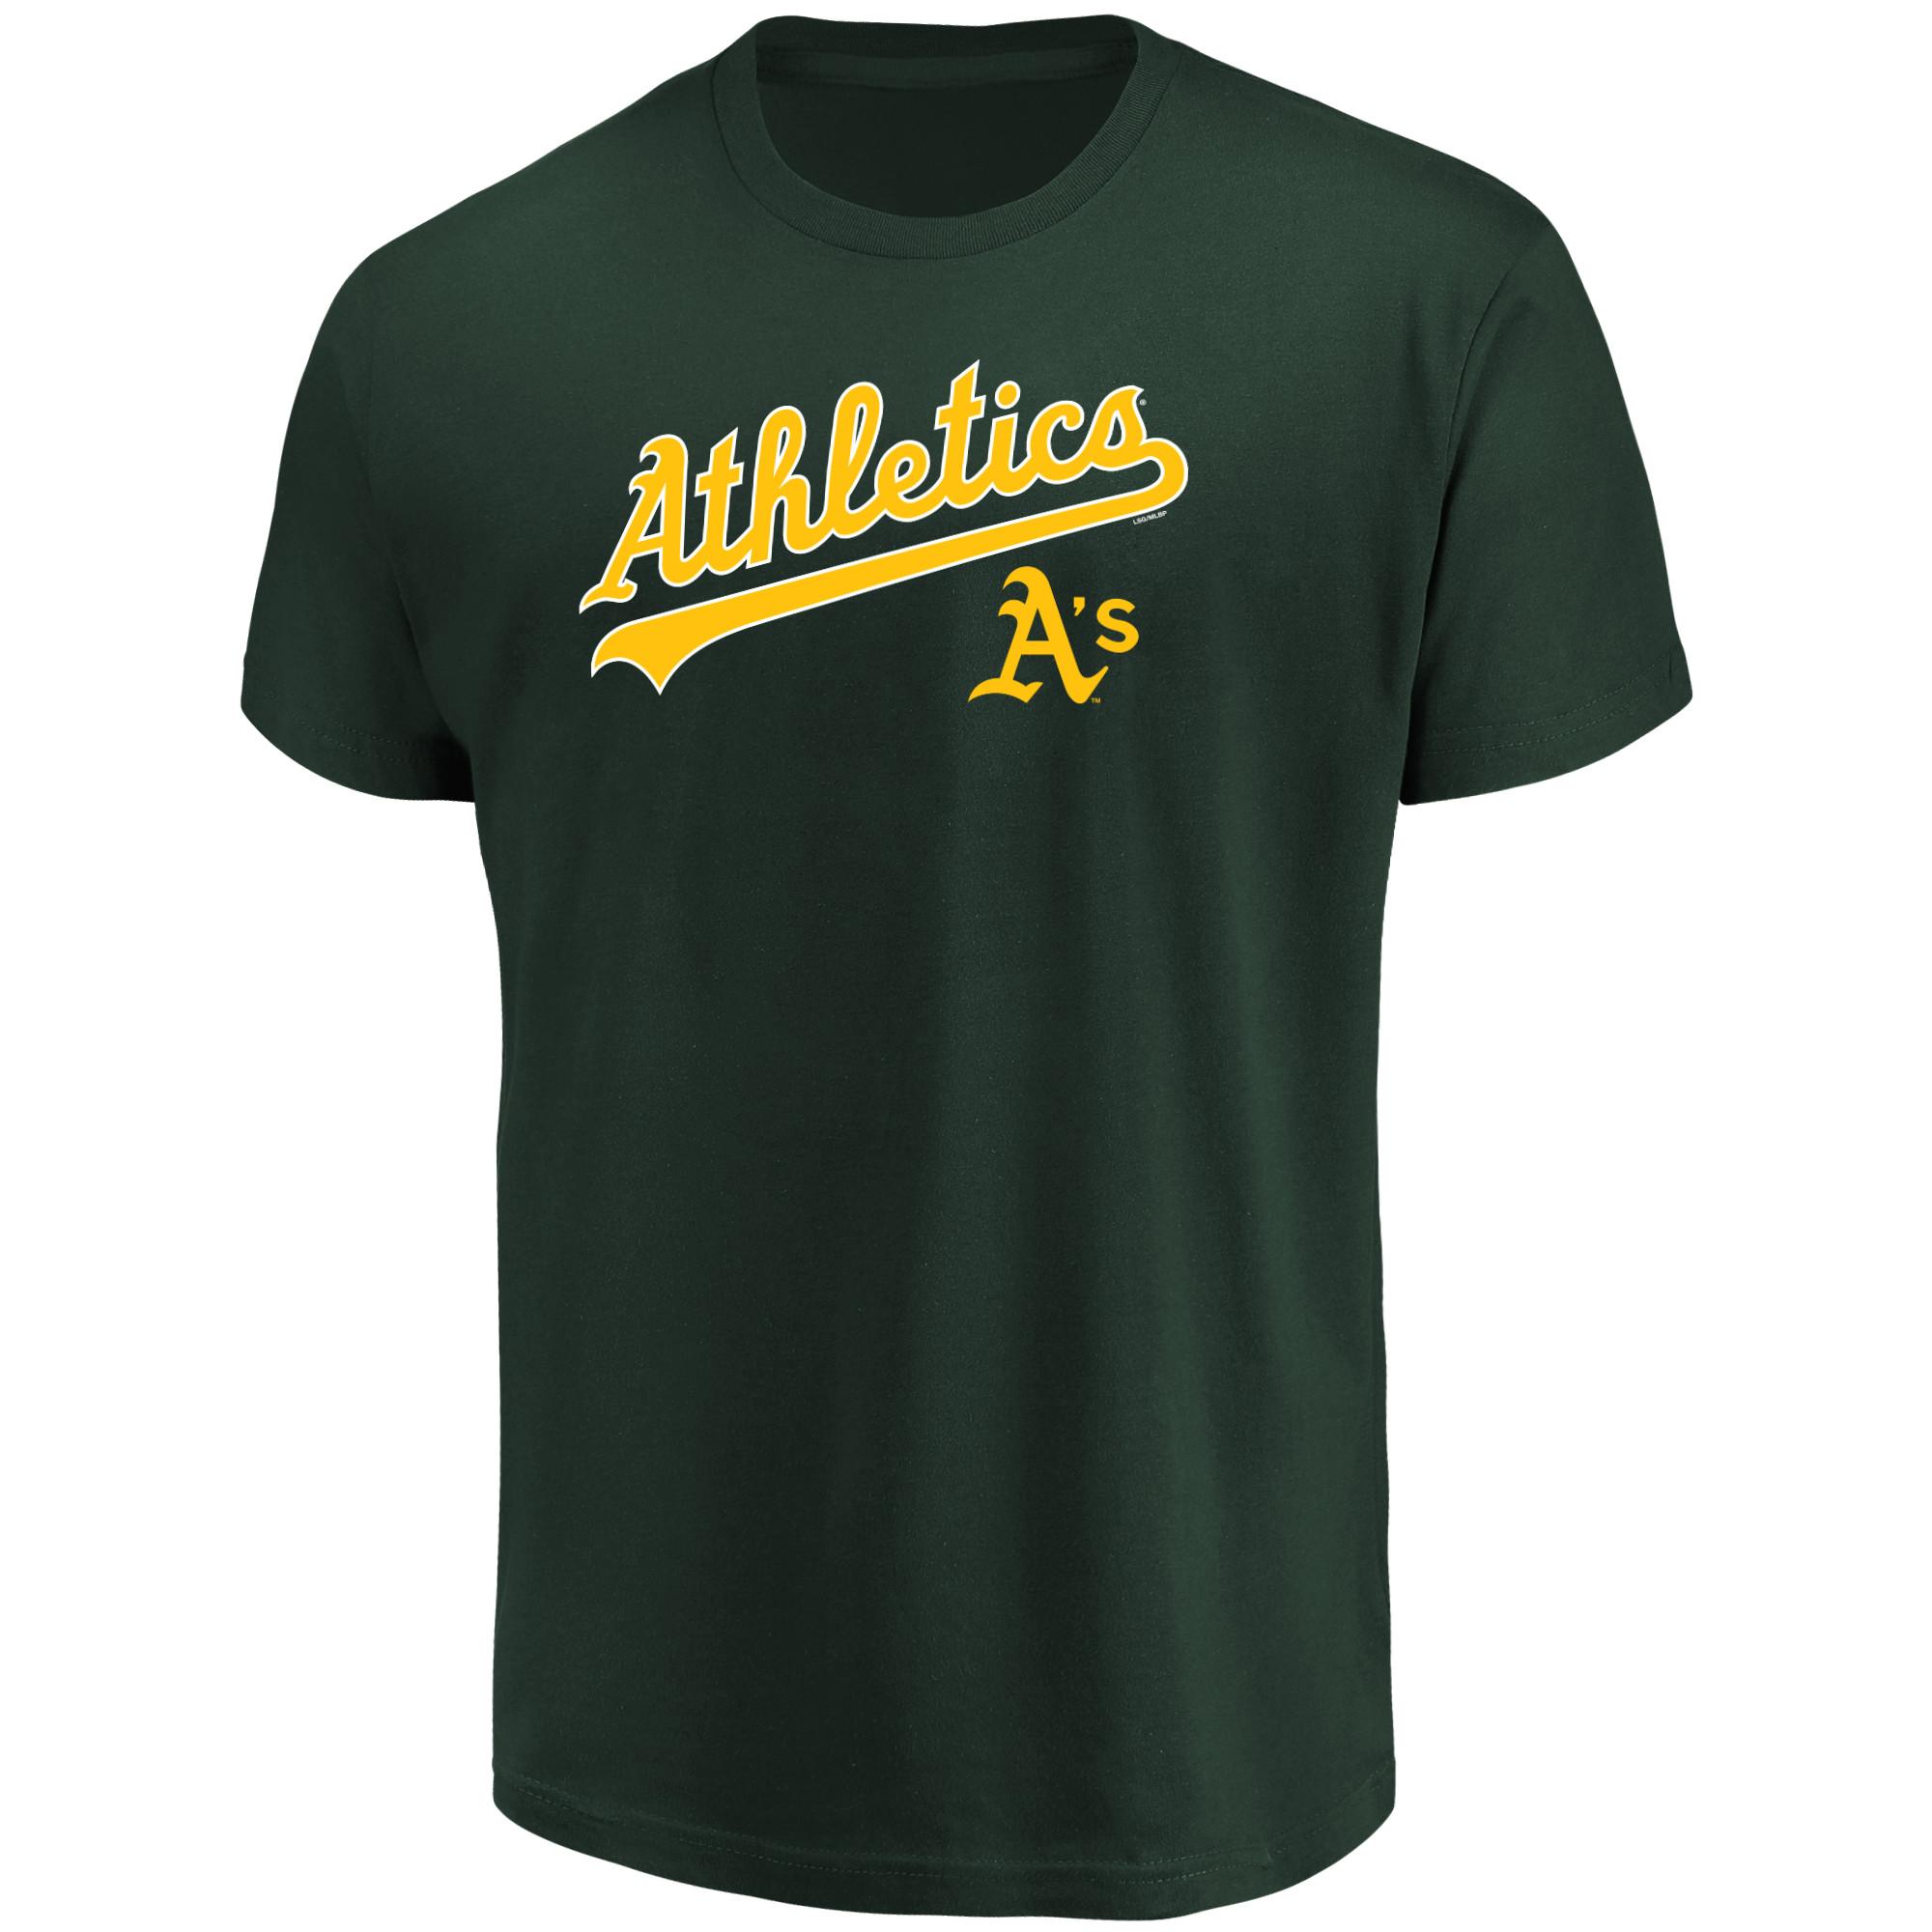 Men's Majestic Green Oakland Athletics Bigger Series Sweep T-Shirt